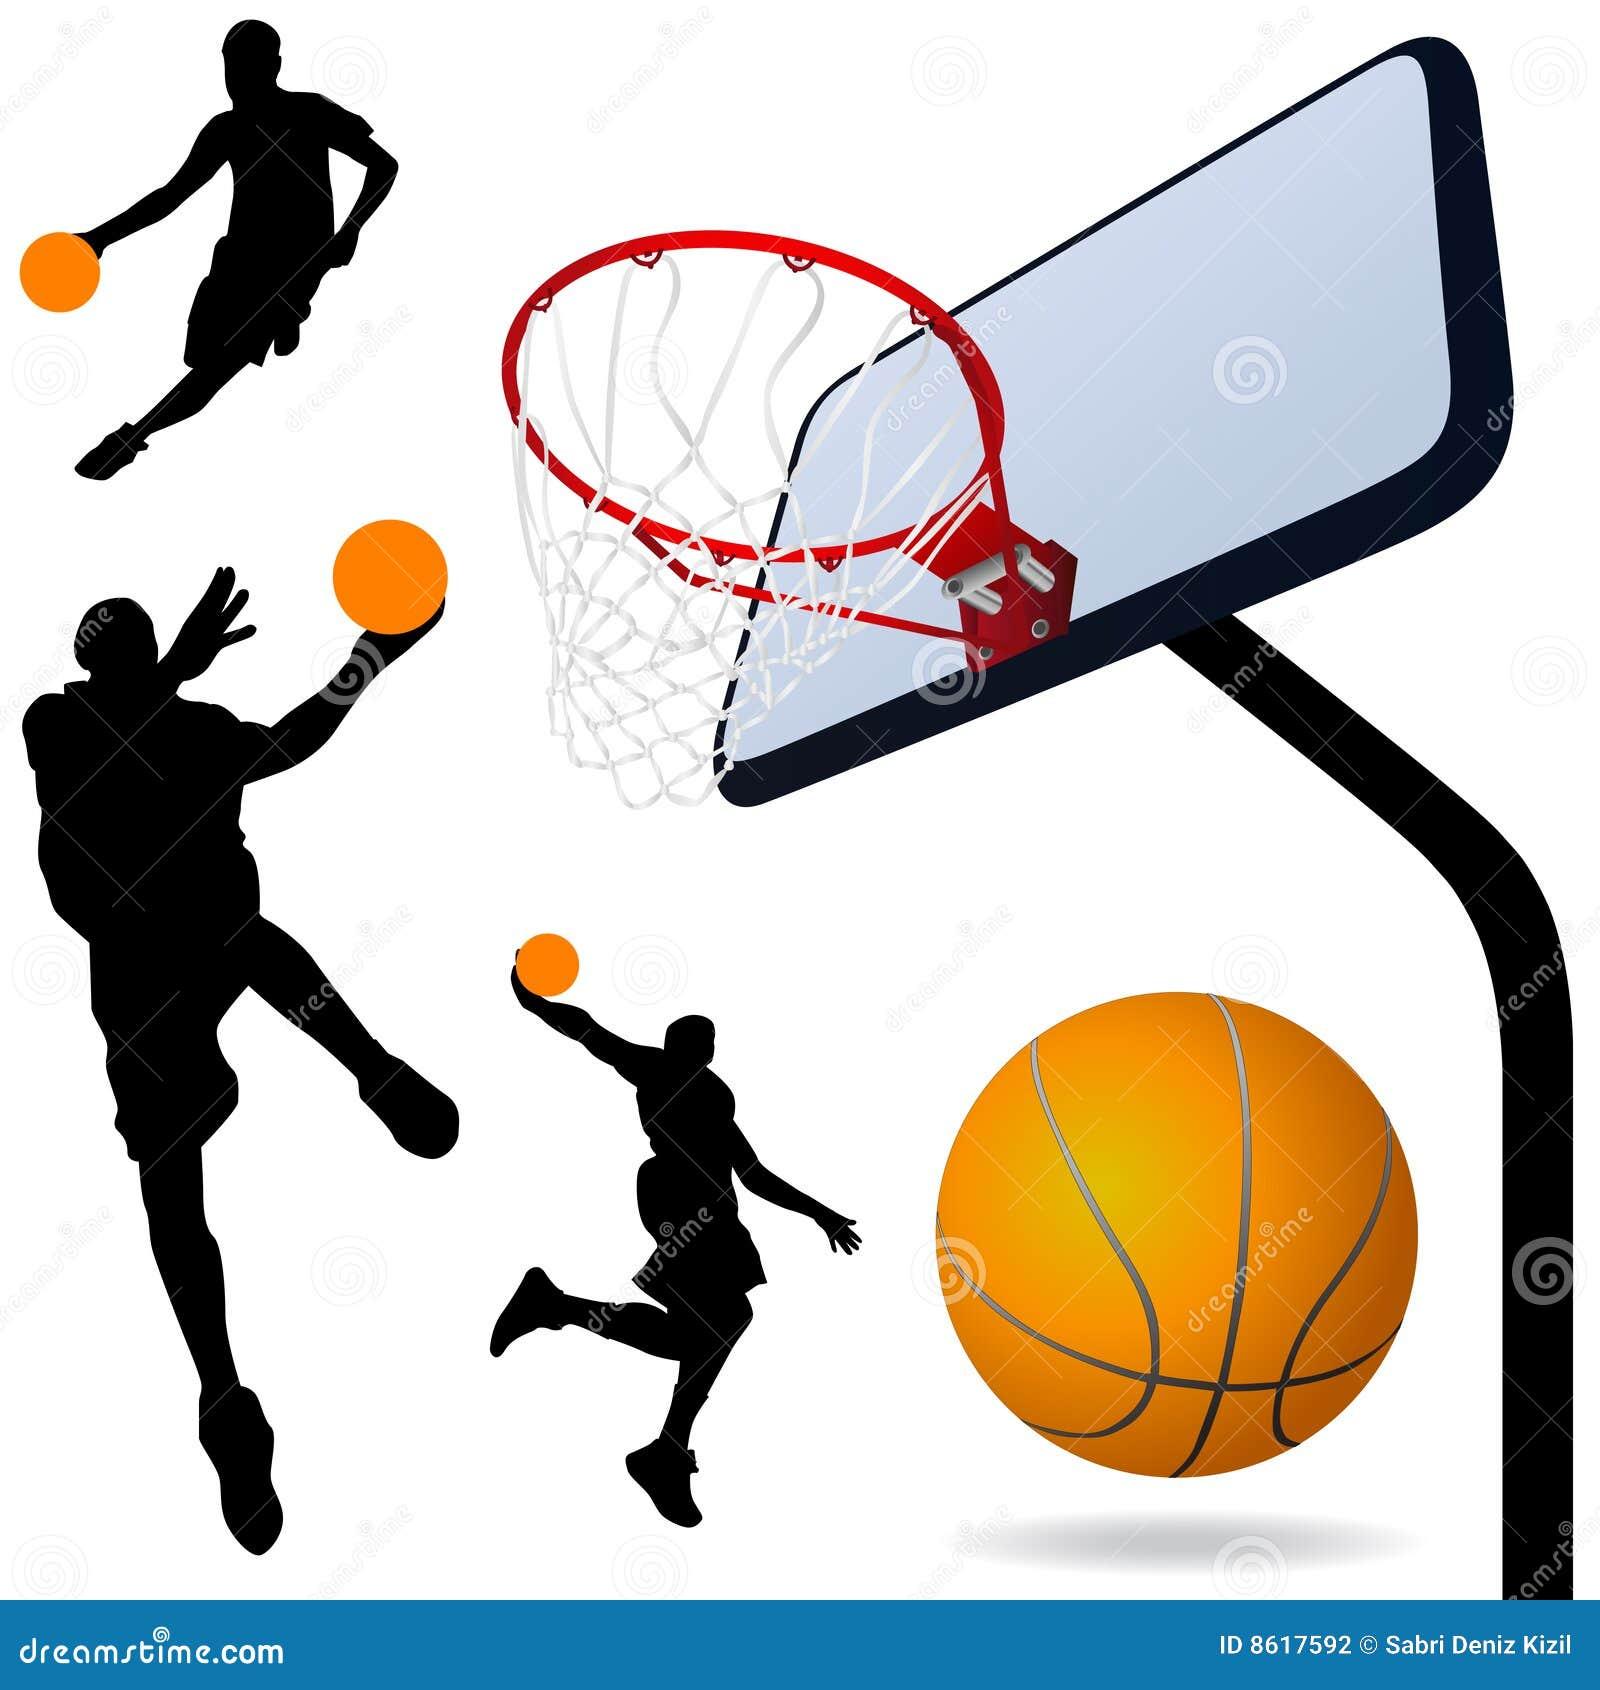 Basketball Vector Stock Vector Illustration Of Illustration 8617592